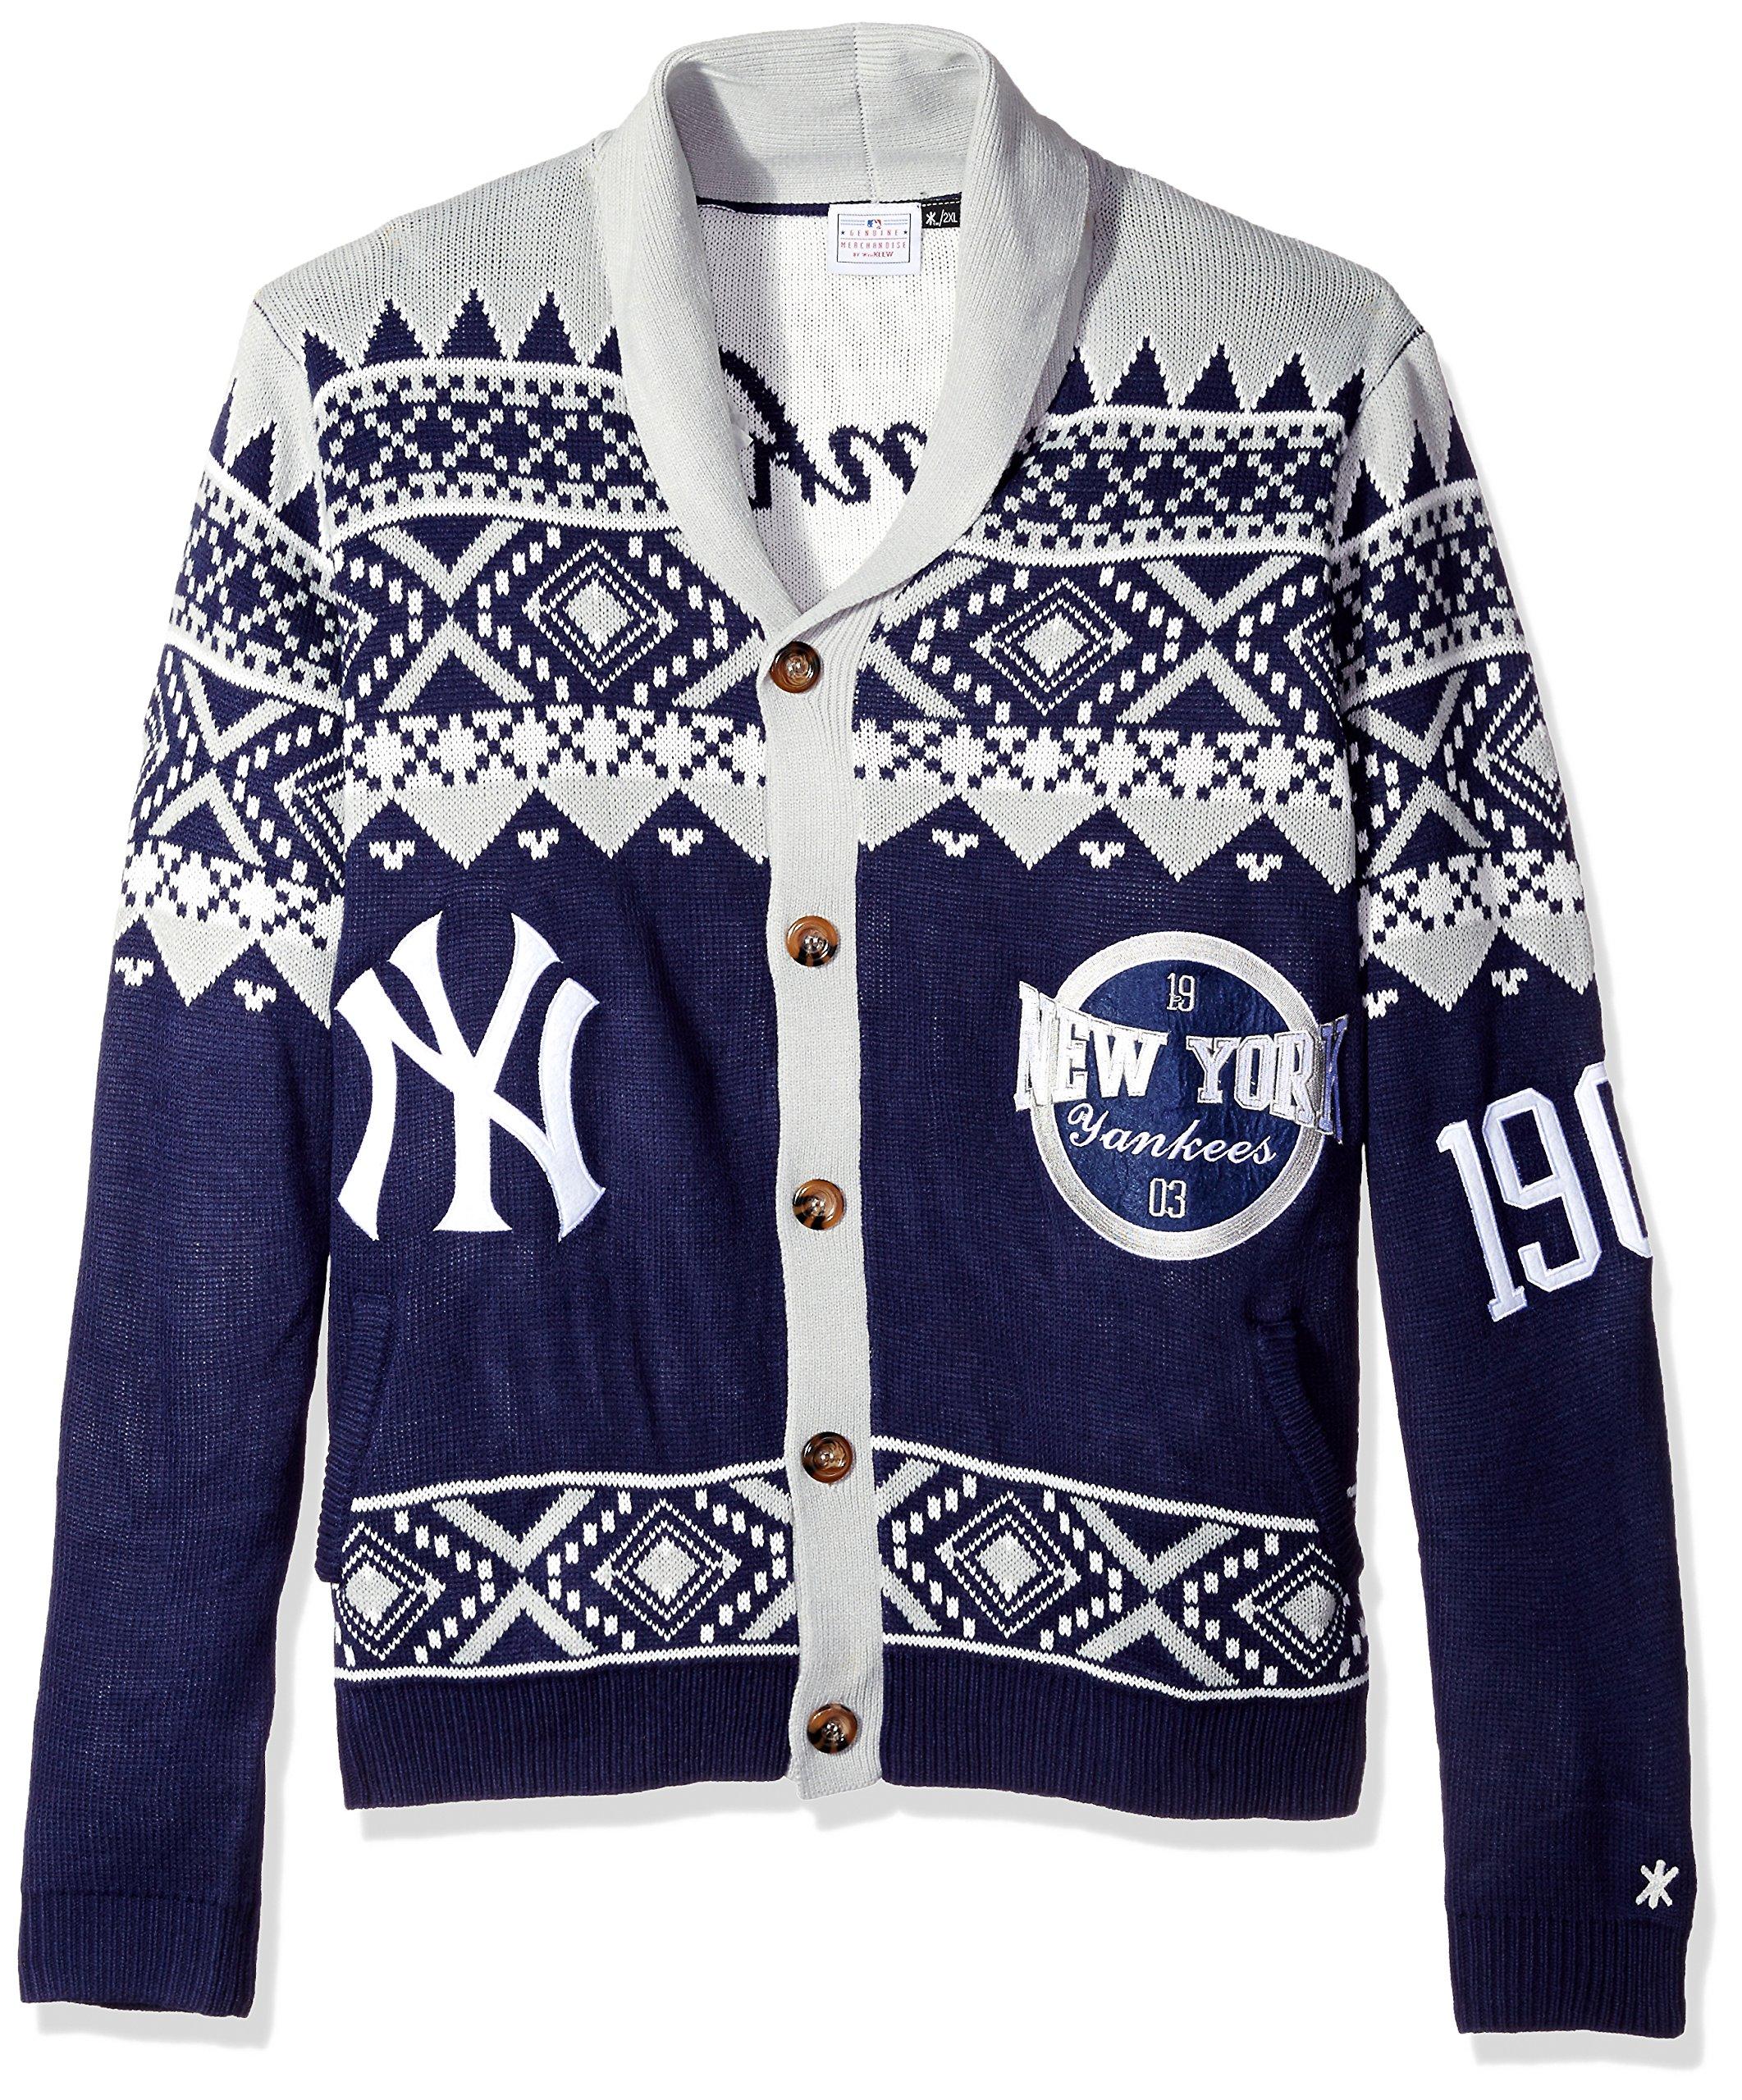 MLB New York Yankees Men's 2015 Ugly Cardigan Sweater, Medium, Team Color